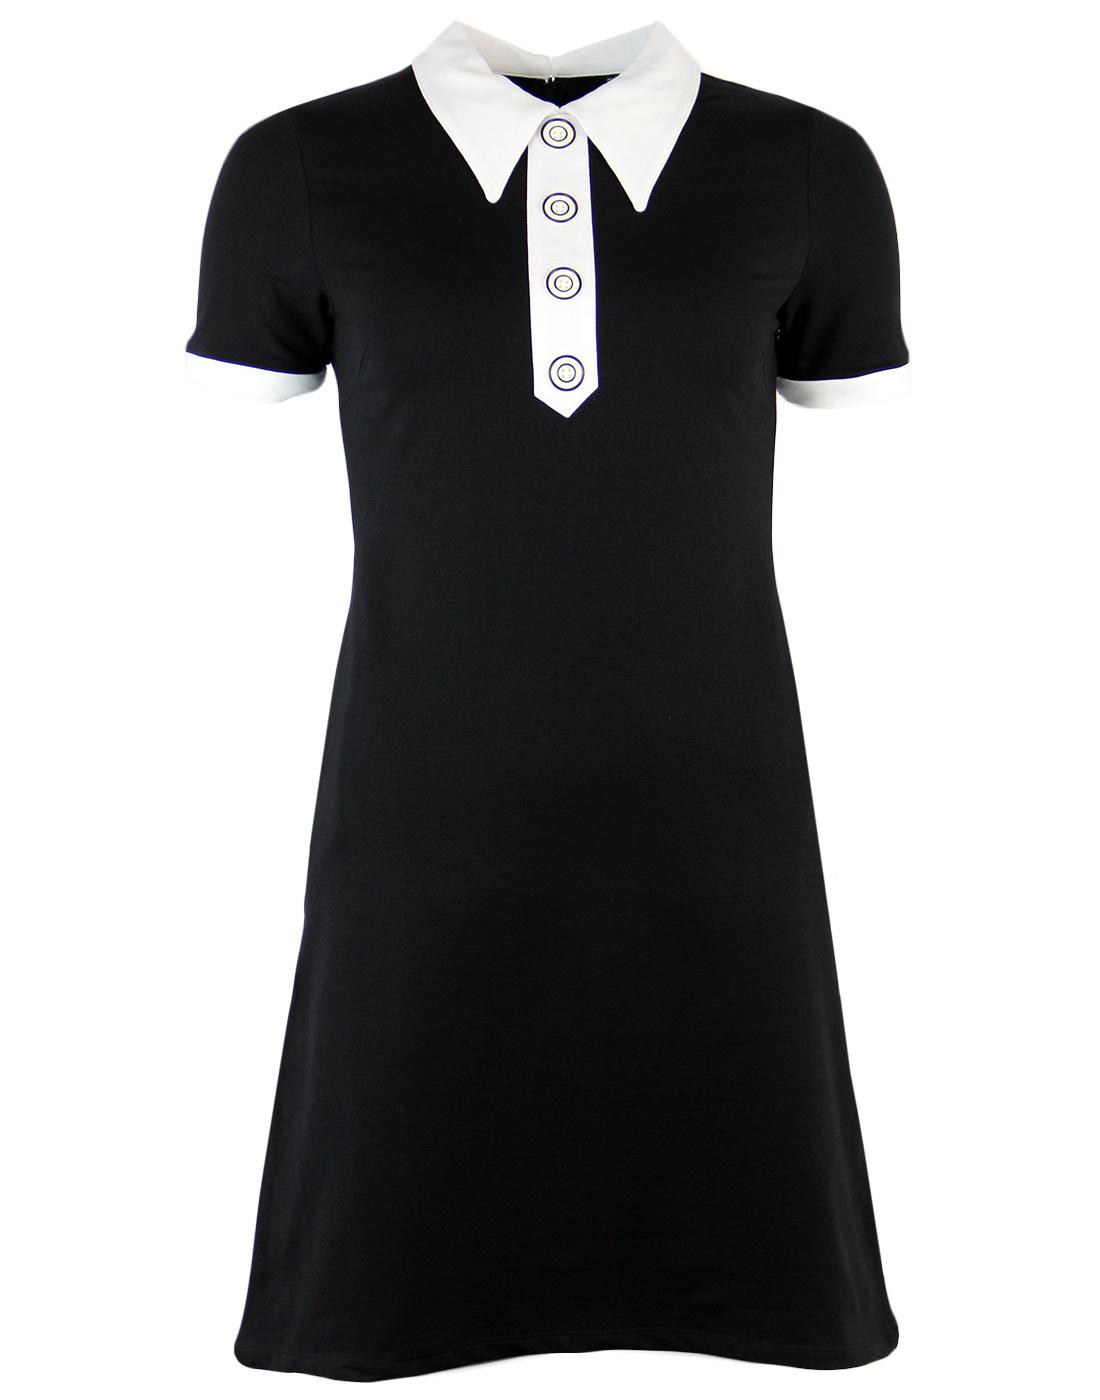 Apricot MADEMOISELLE YEYE Mod Spear Collar Dress B